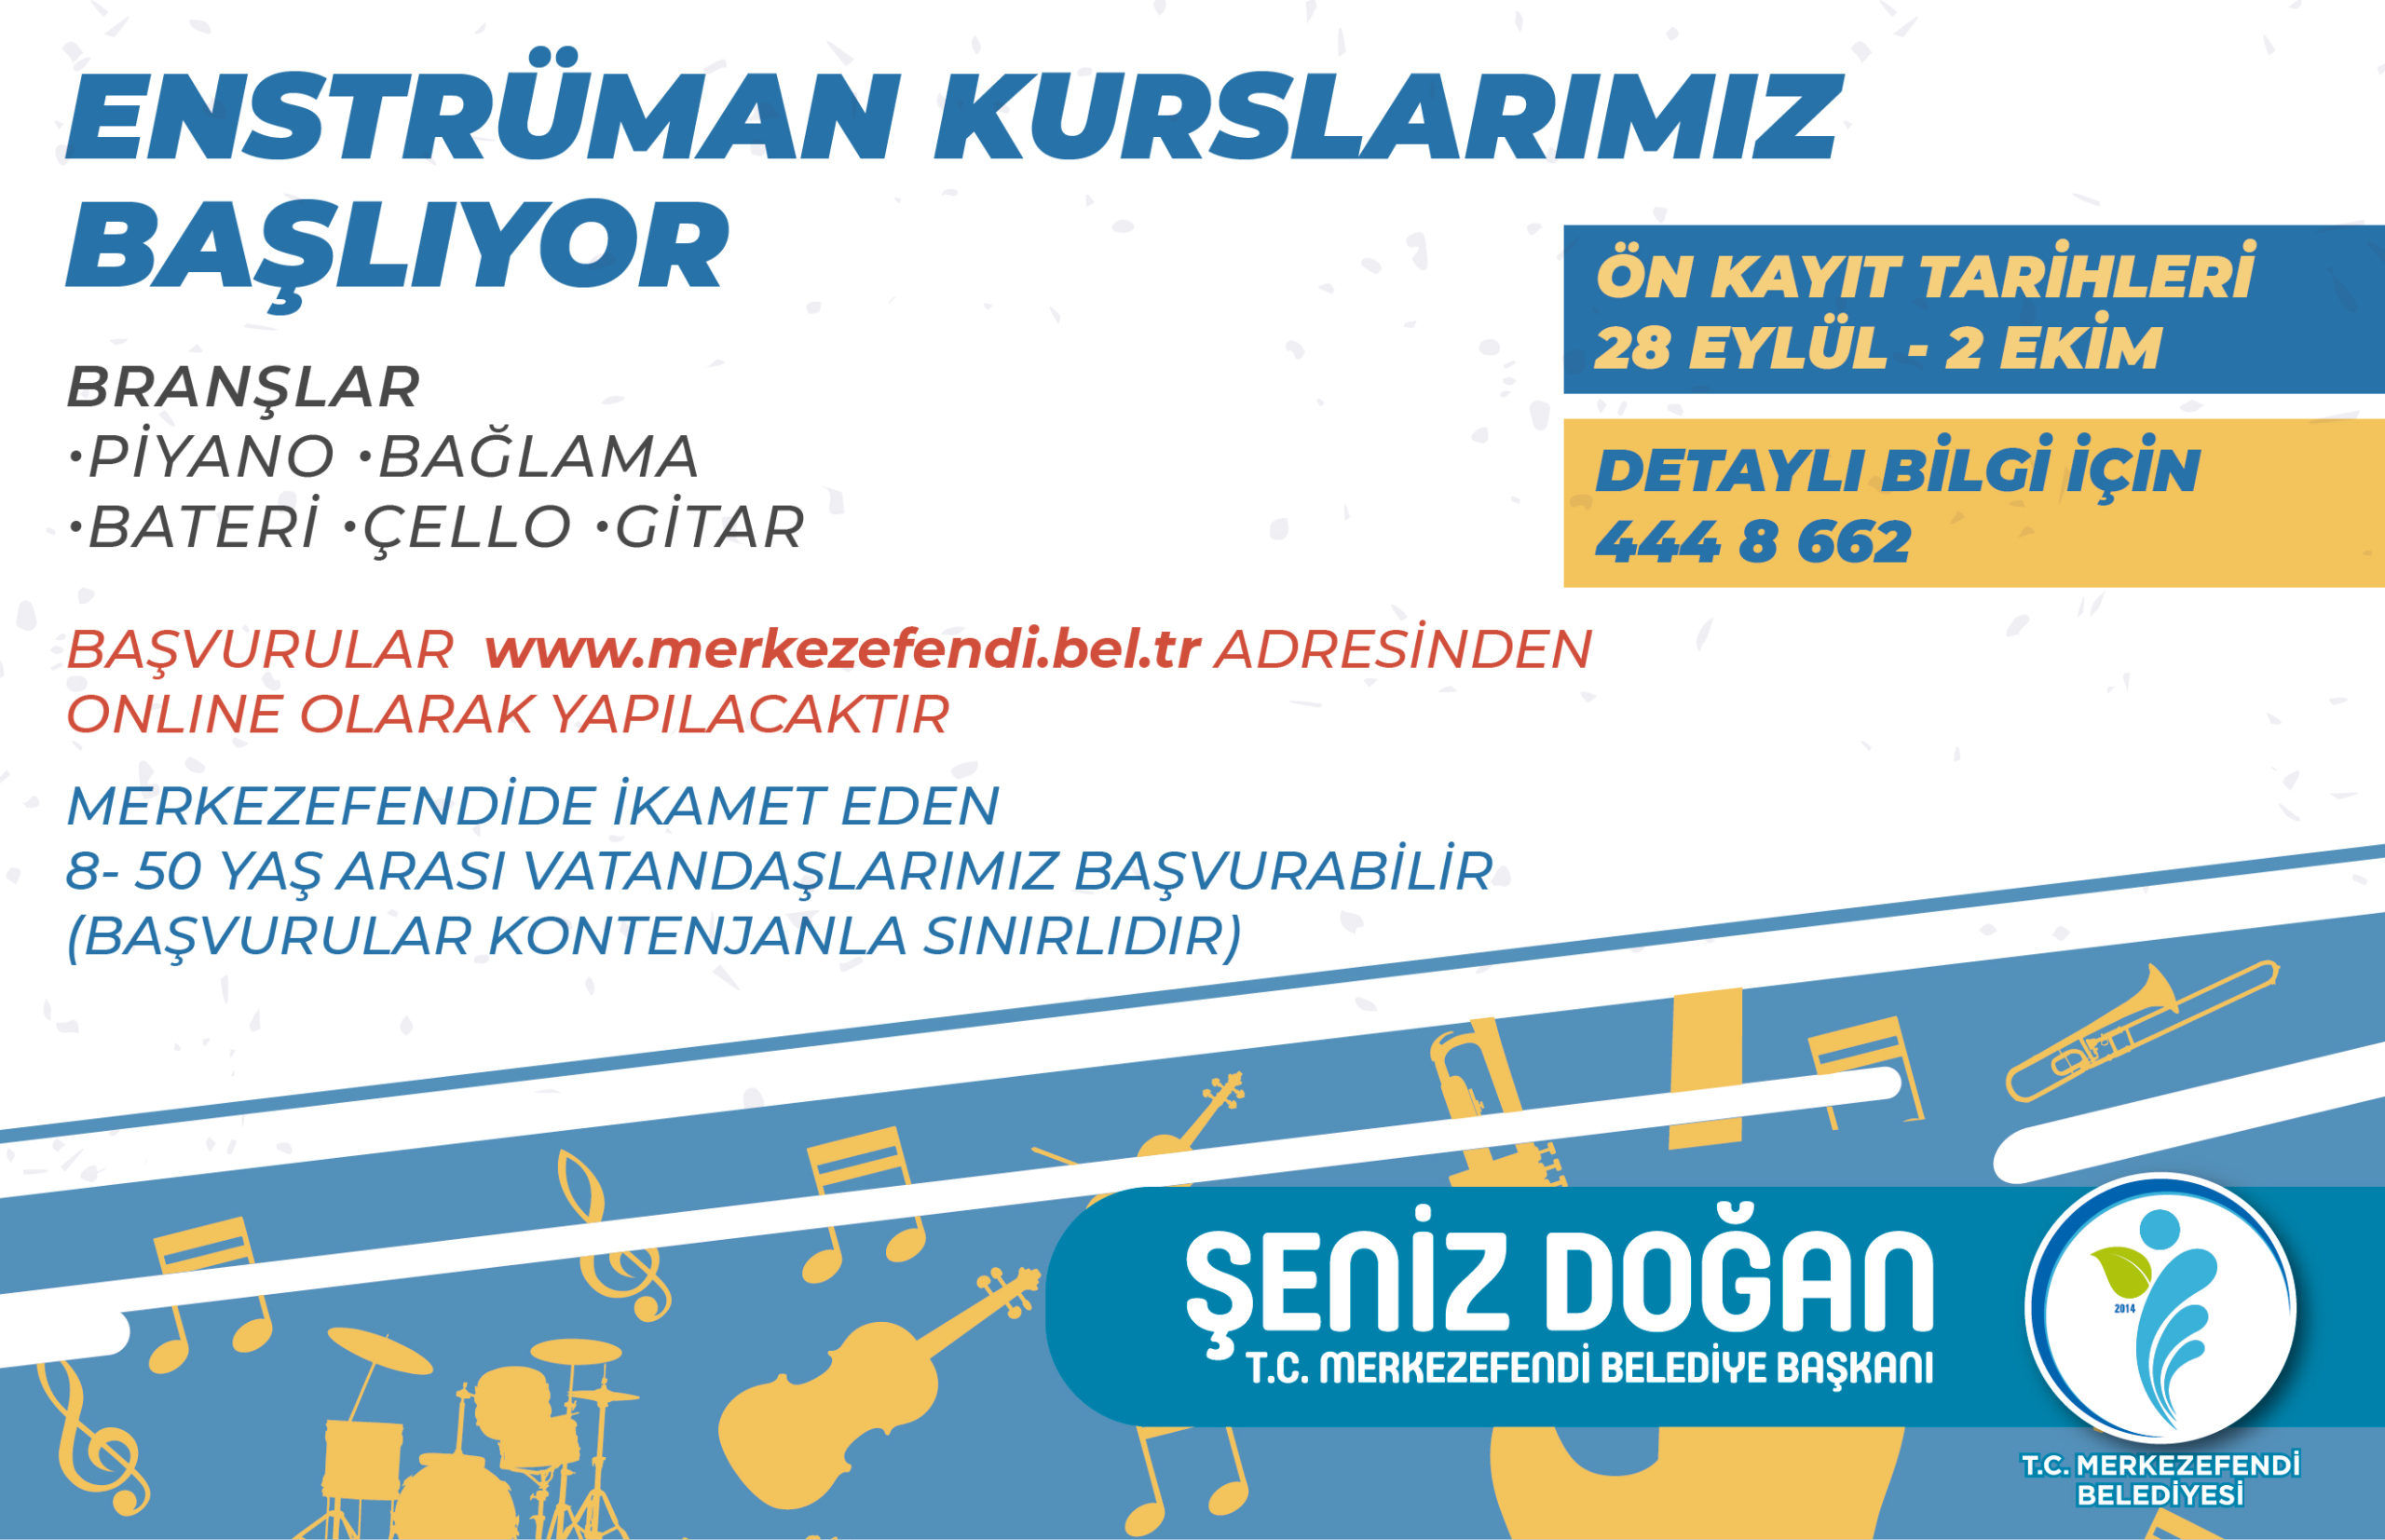 1 3965 scaled - MERKEZEFENDİ'DE KURS KAYITLARI BAŞLADI